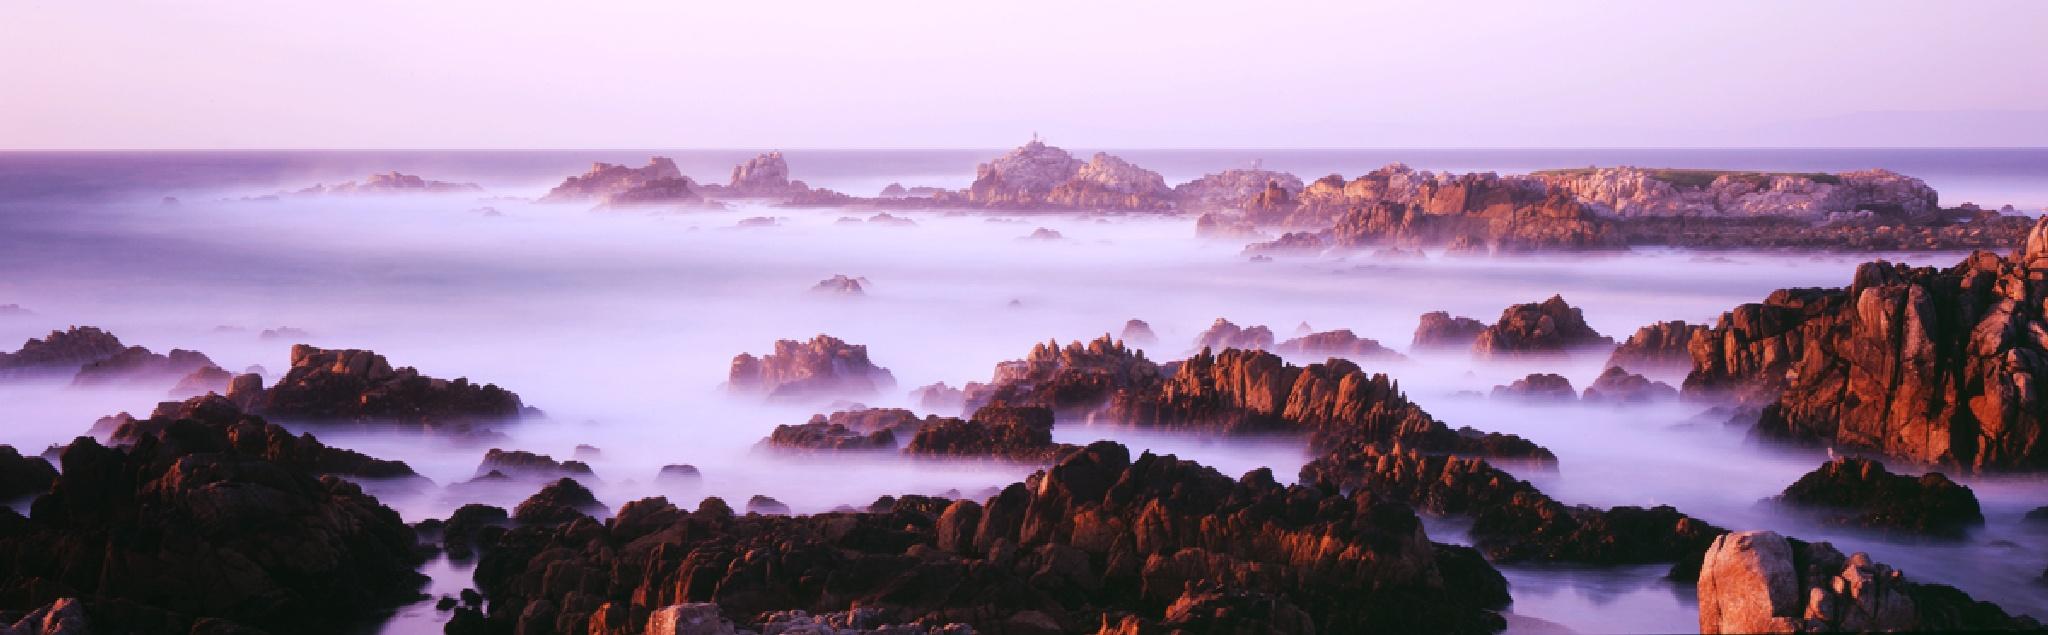 Pacific Grove by Shailendra